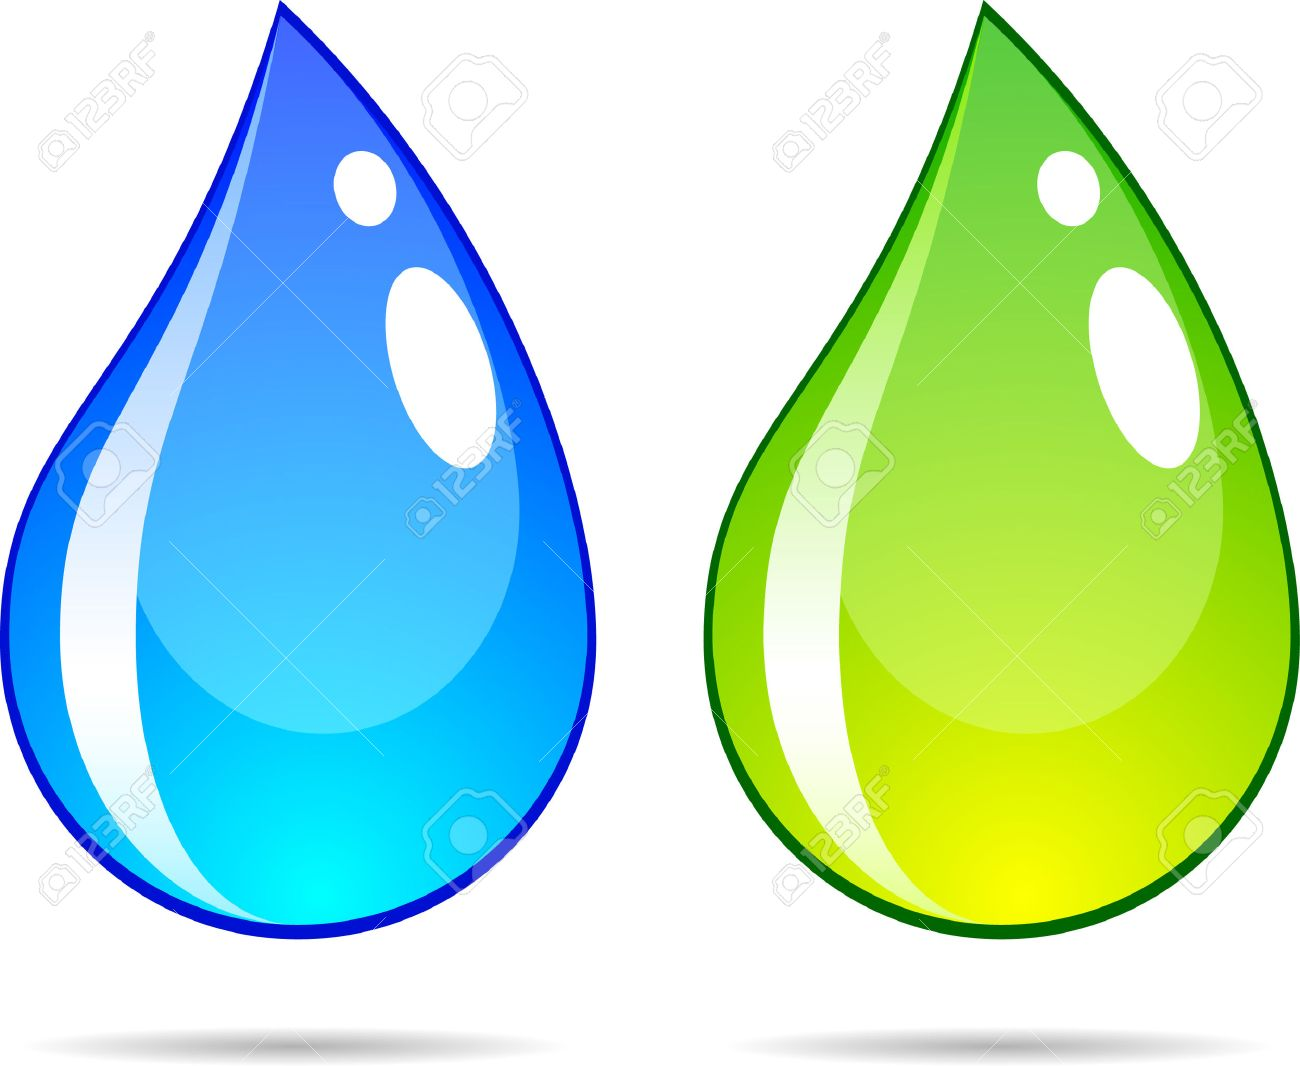 bright water drops vector illustration royalty free cliparts rh 123rf com water drops vector download water droplets vector